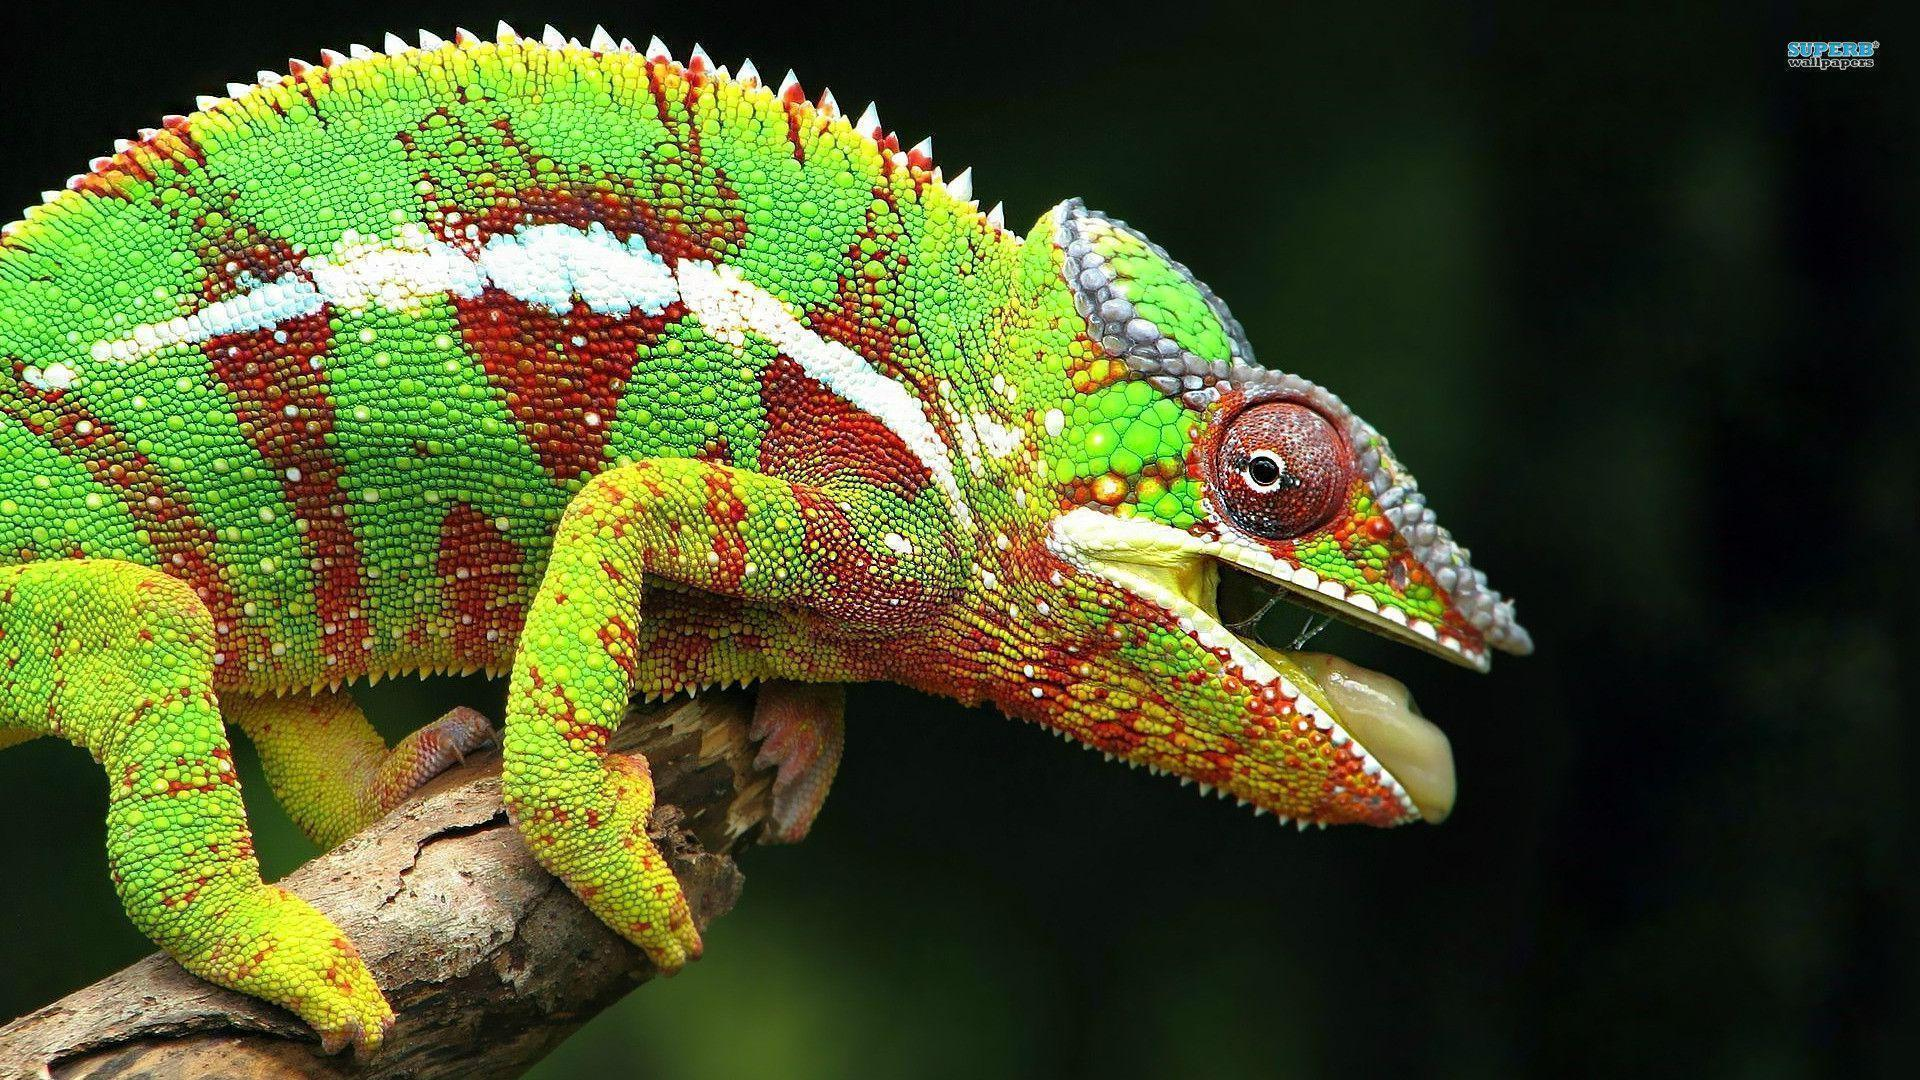 chameleon wallpaper 9661 - photo #14